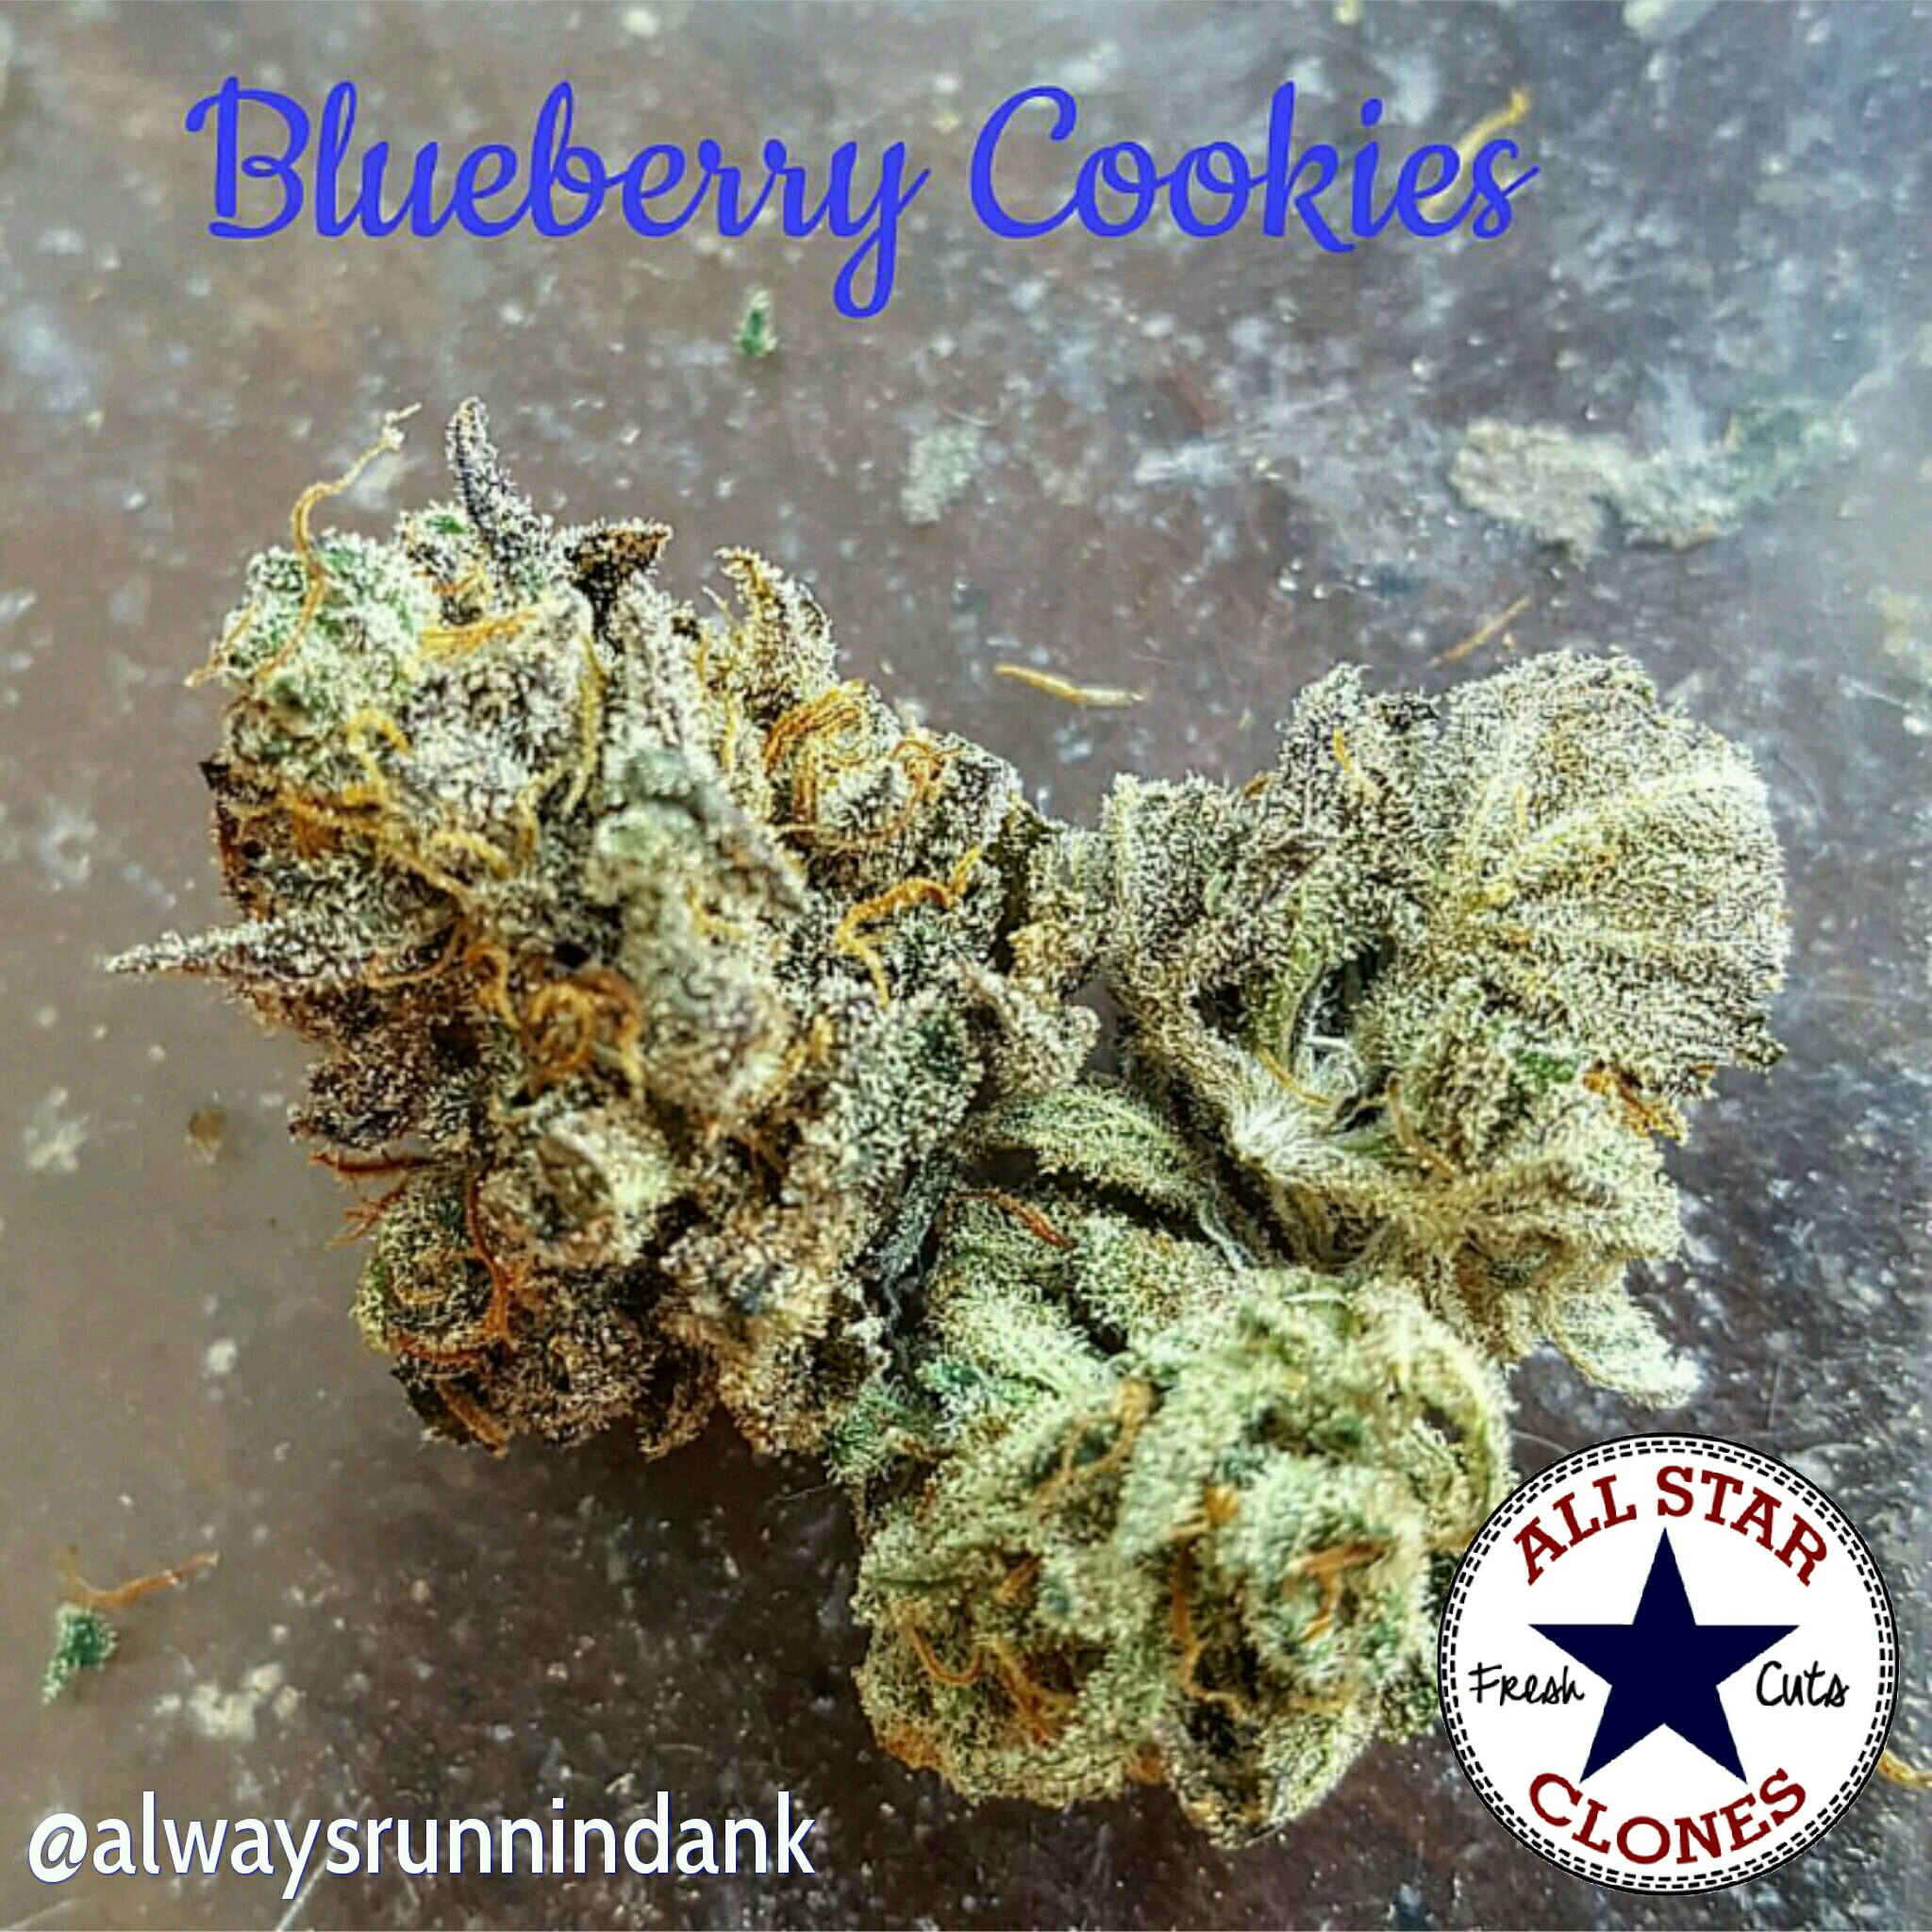 Blueberry Cookies - Medicine Man